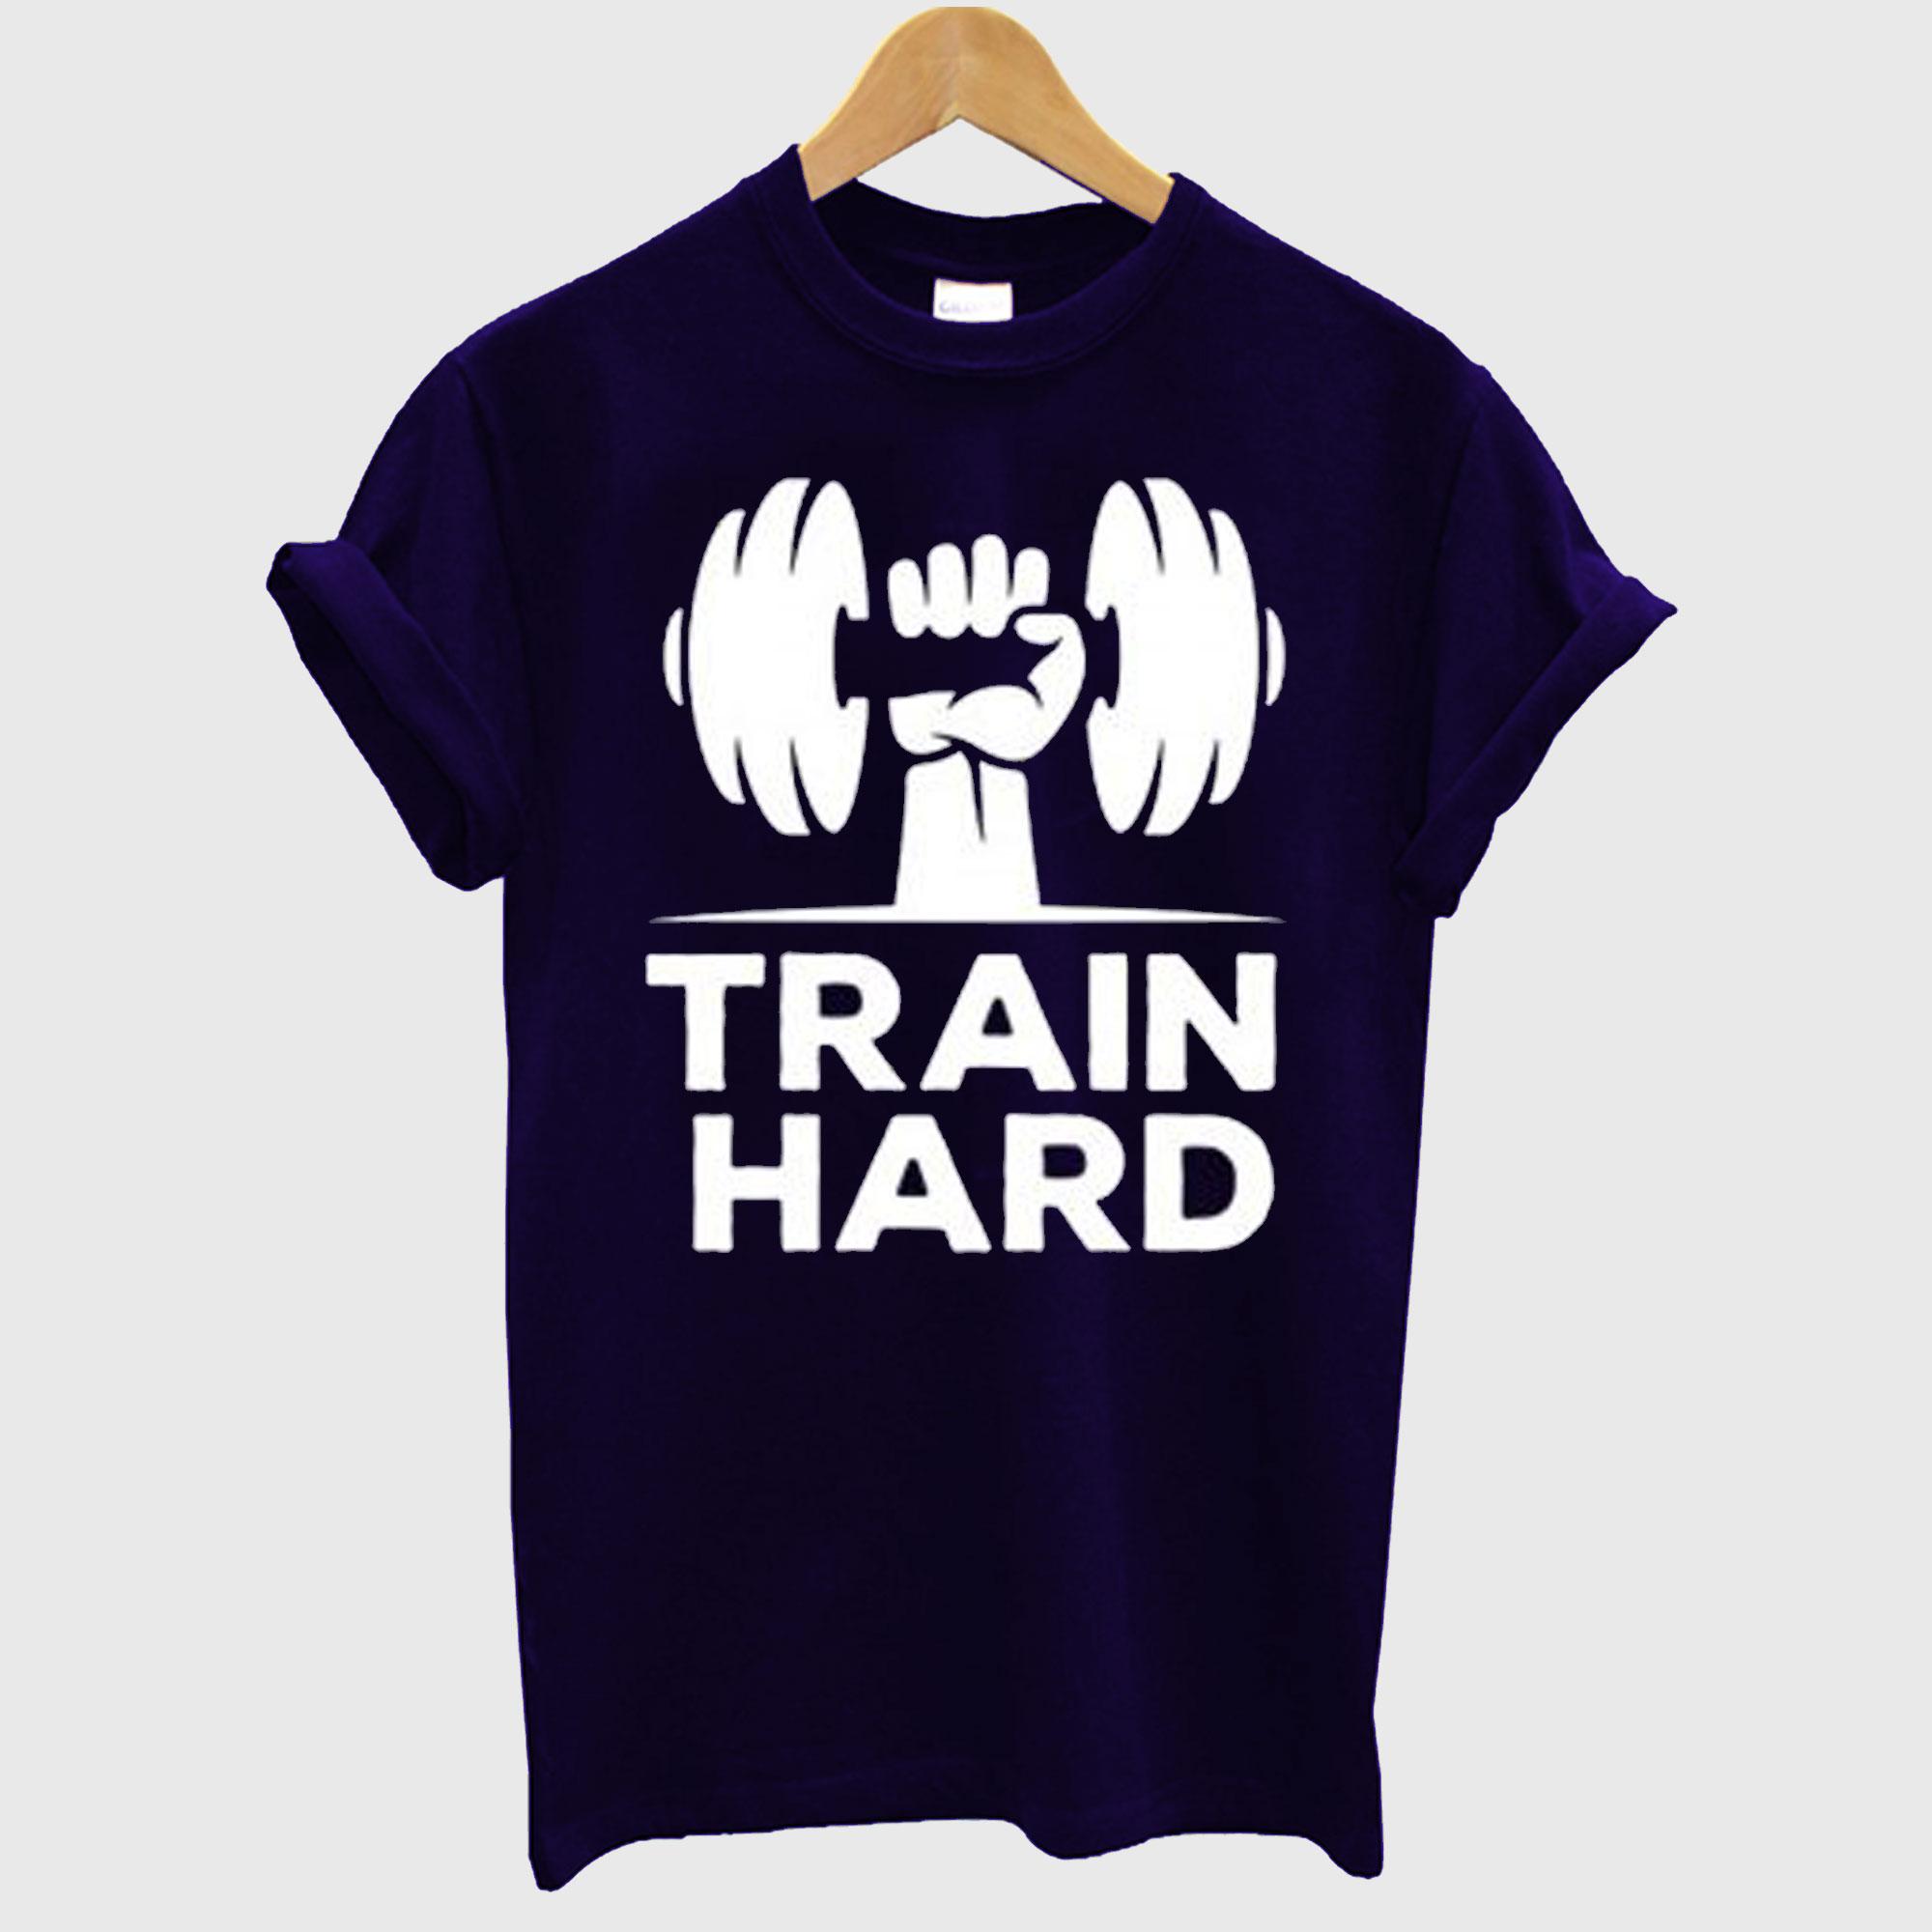 Work Harder Gym Motivation T shirt